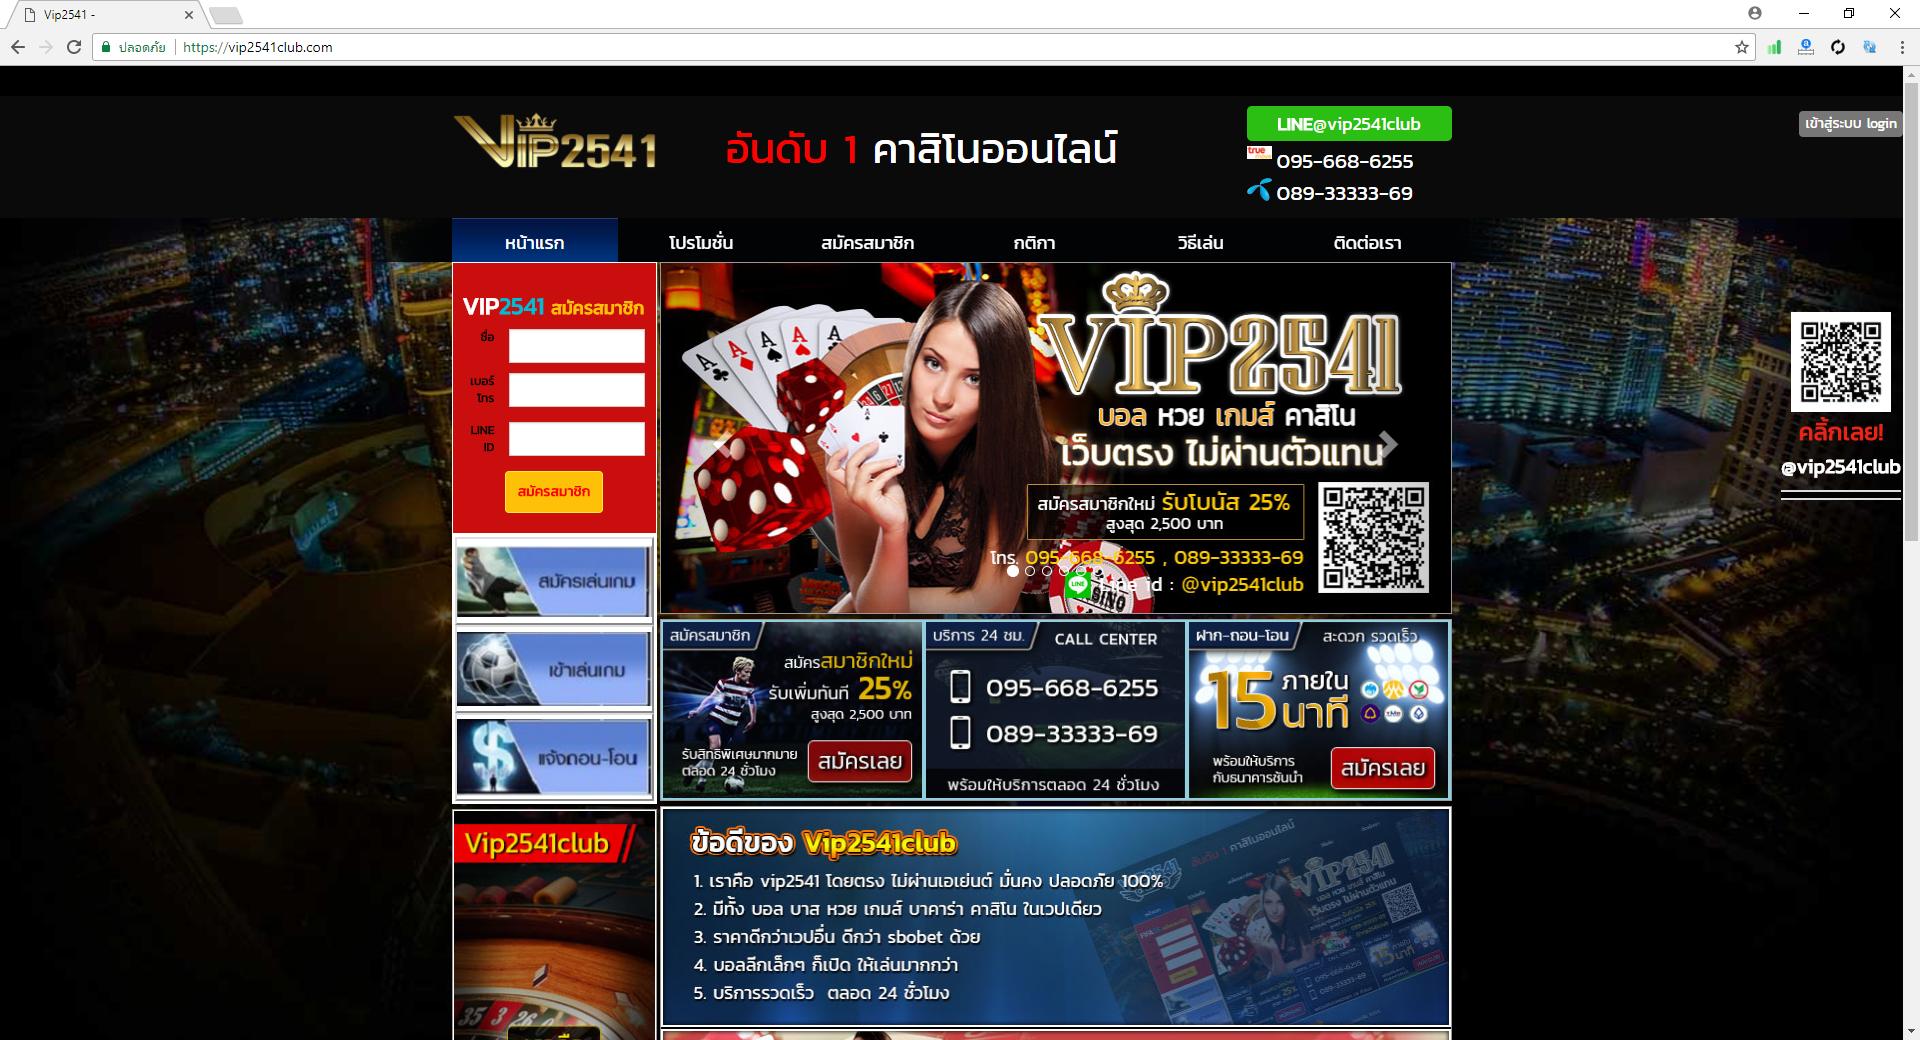 vip2541club